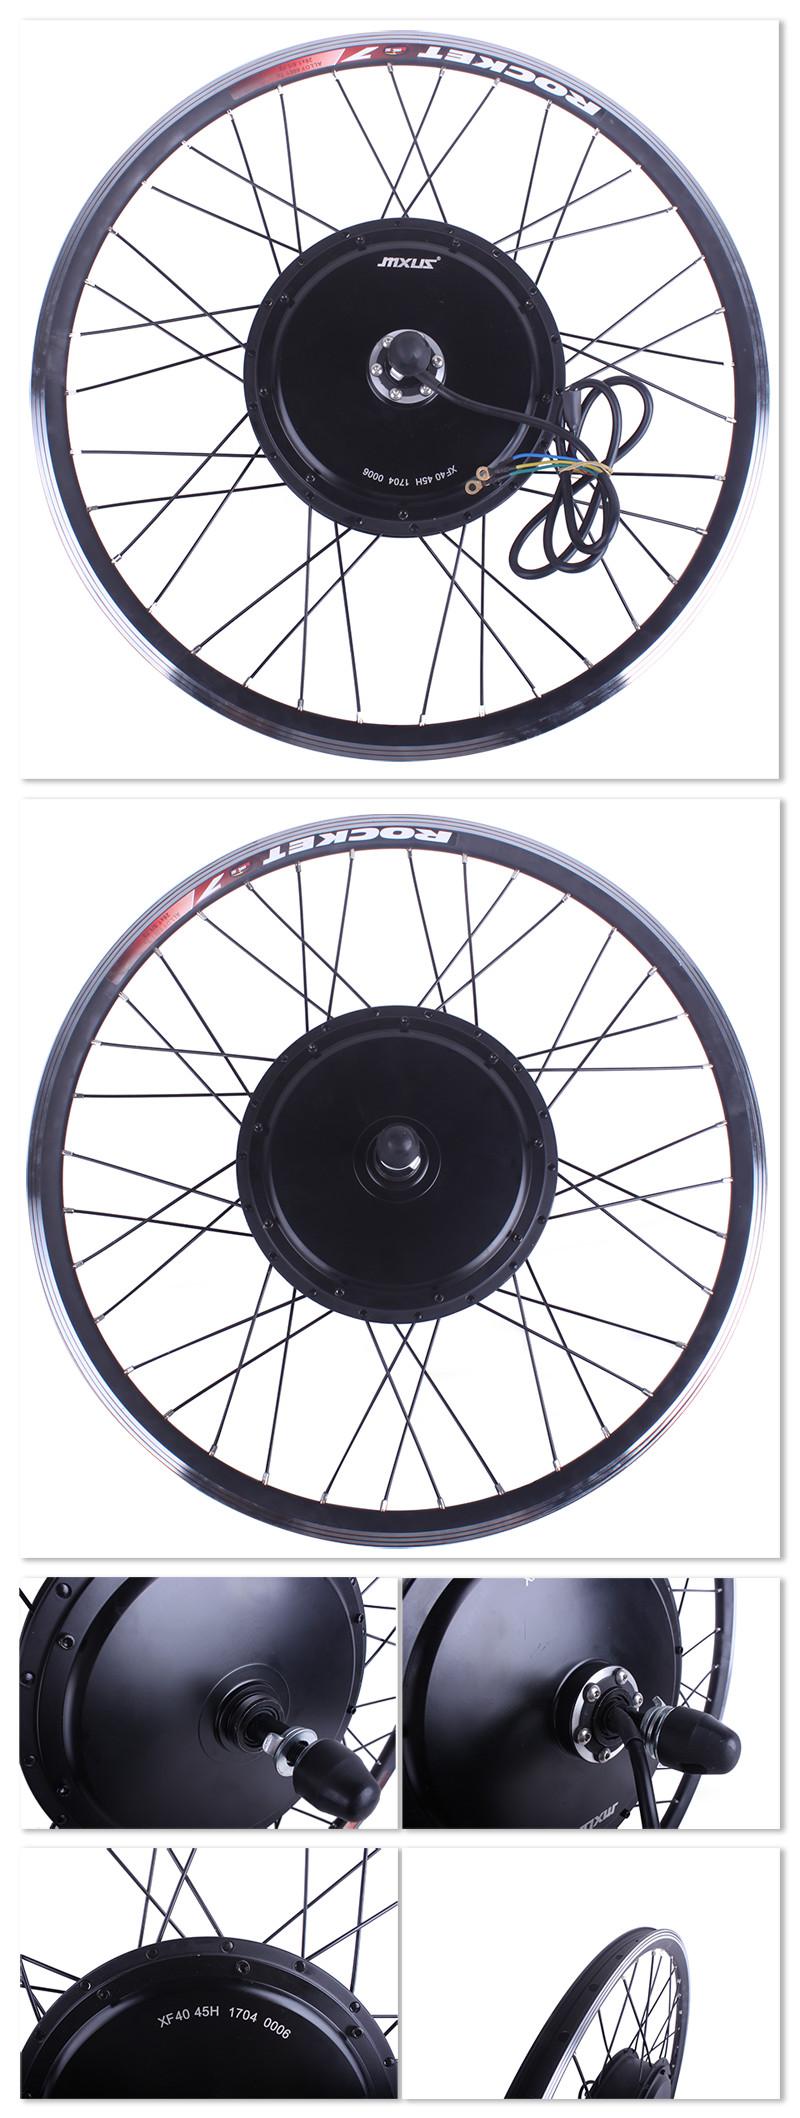 Sale Free Shipping 1500W E-bike Electric Bike Conversion kit Driect Drive Motor MXUS 48V 52V 13AH 17AH Hailong Battery LCD 10